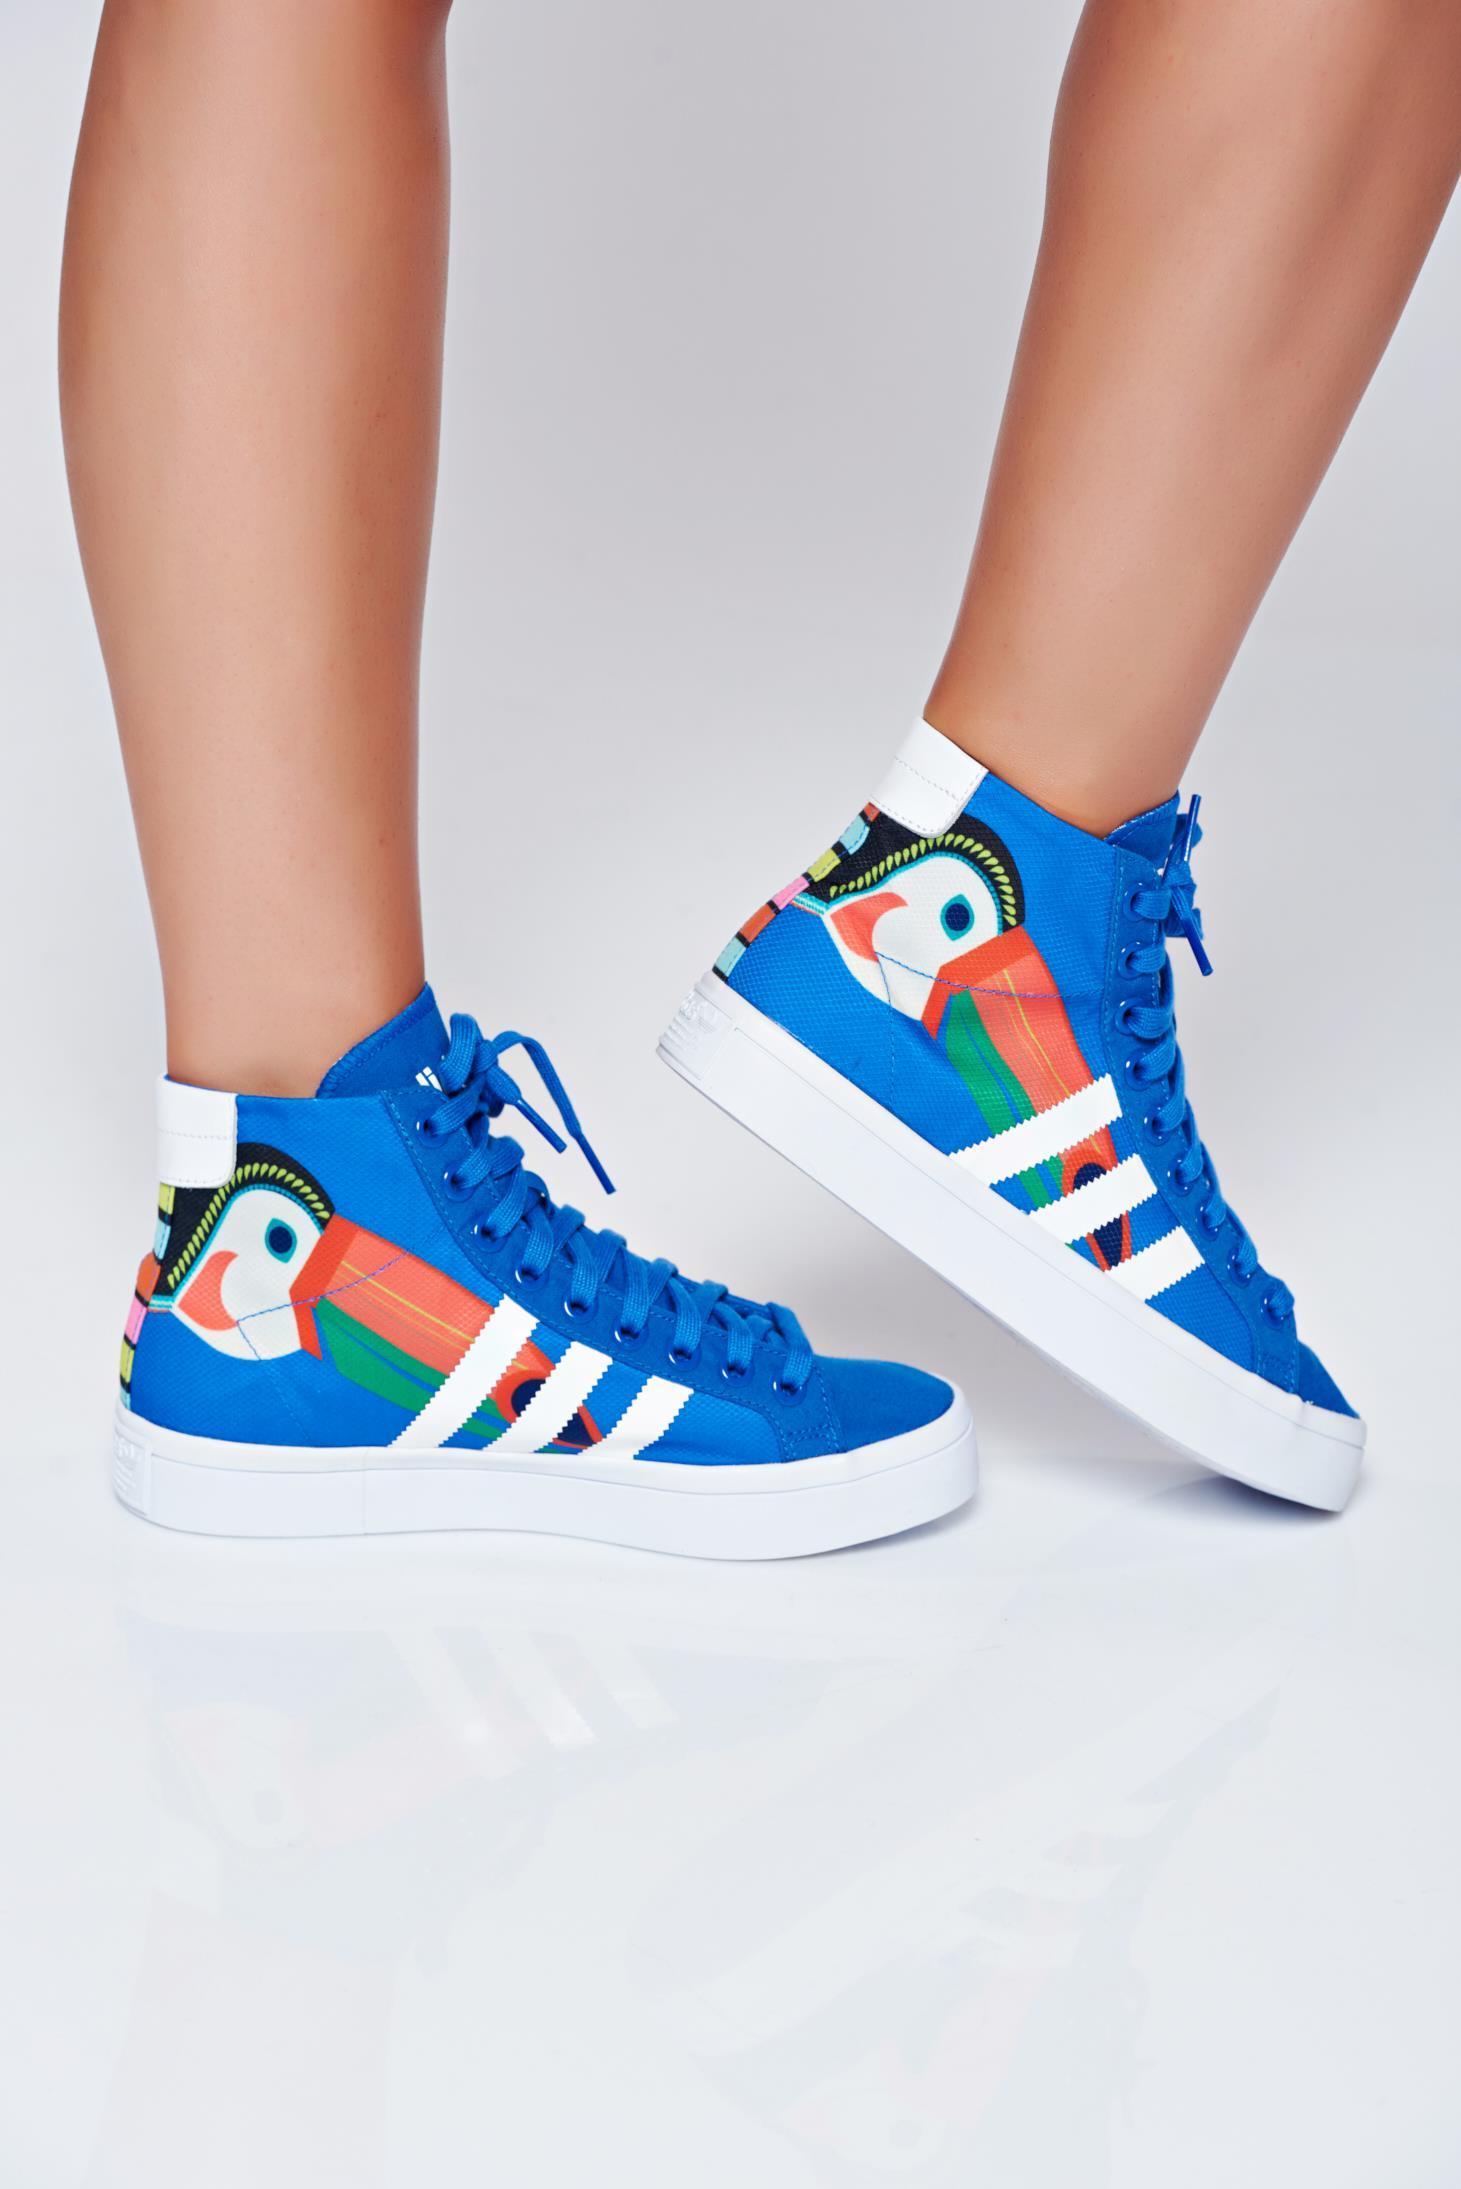 Adidas blue courtvantage originals sneakers with lace print details